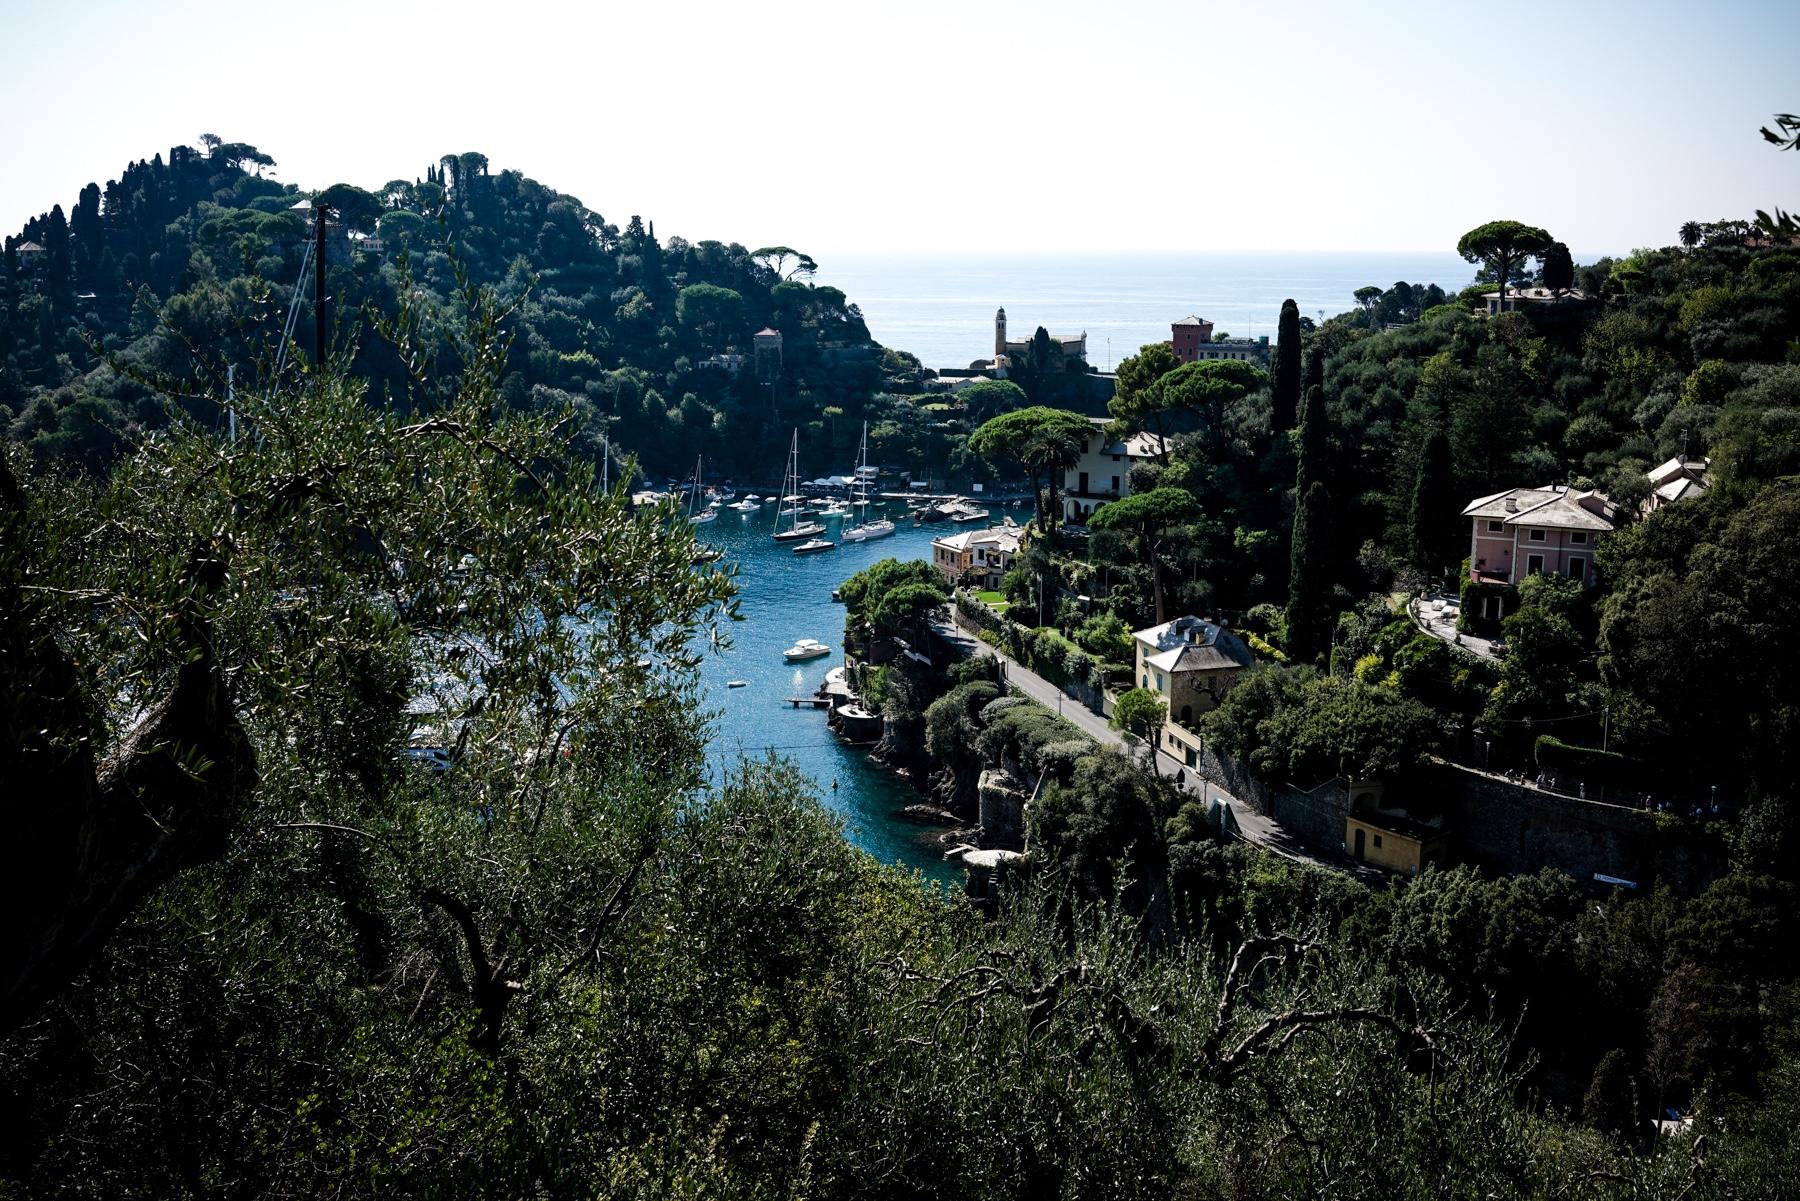 style-shiver-travel-ligurien-italien-28